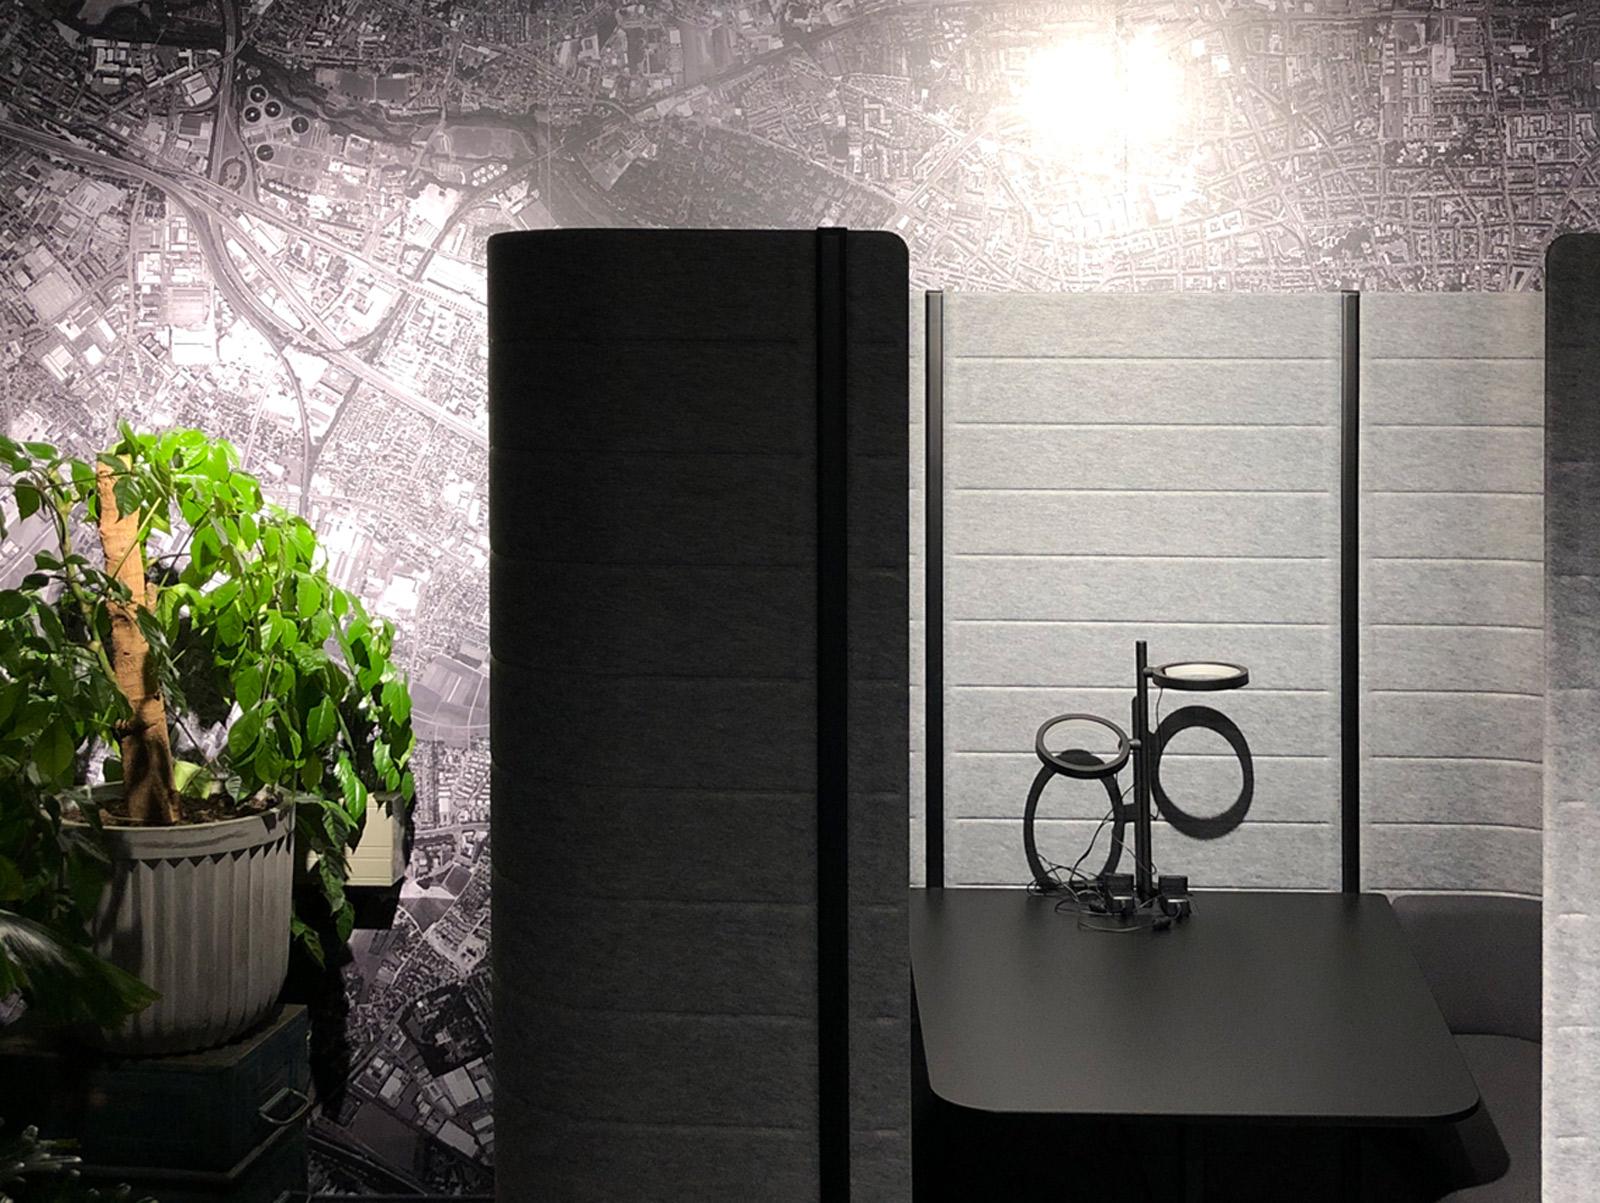 Vollflächiges, bedrucktes Wandtattoo bei Design Offices